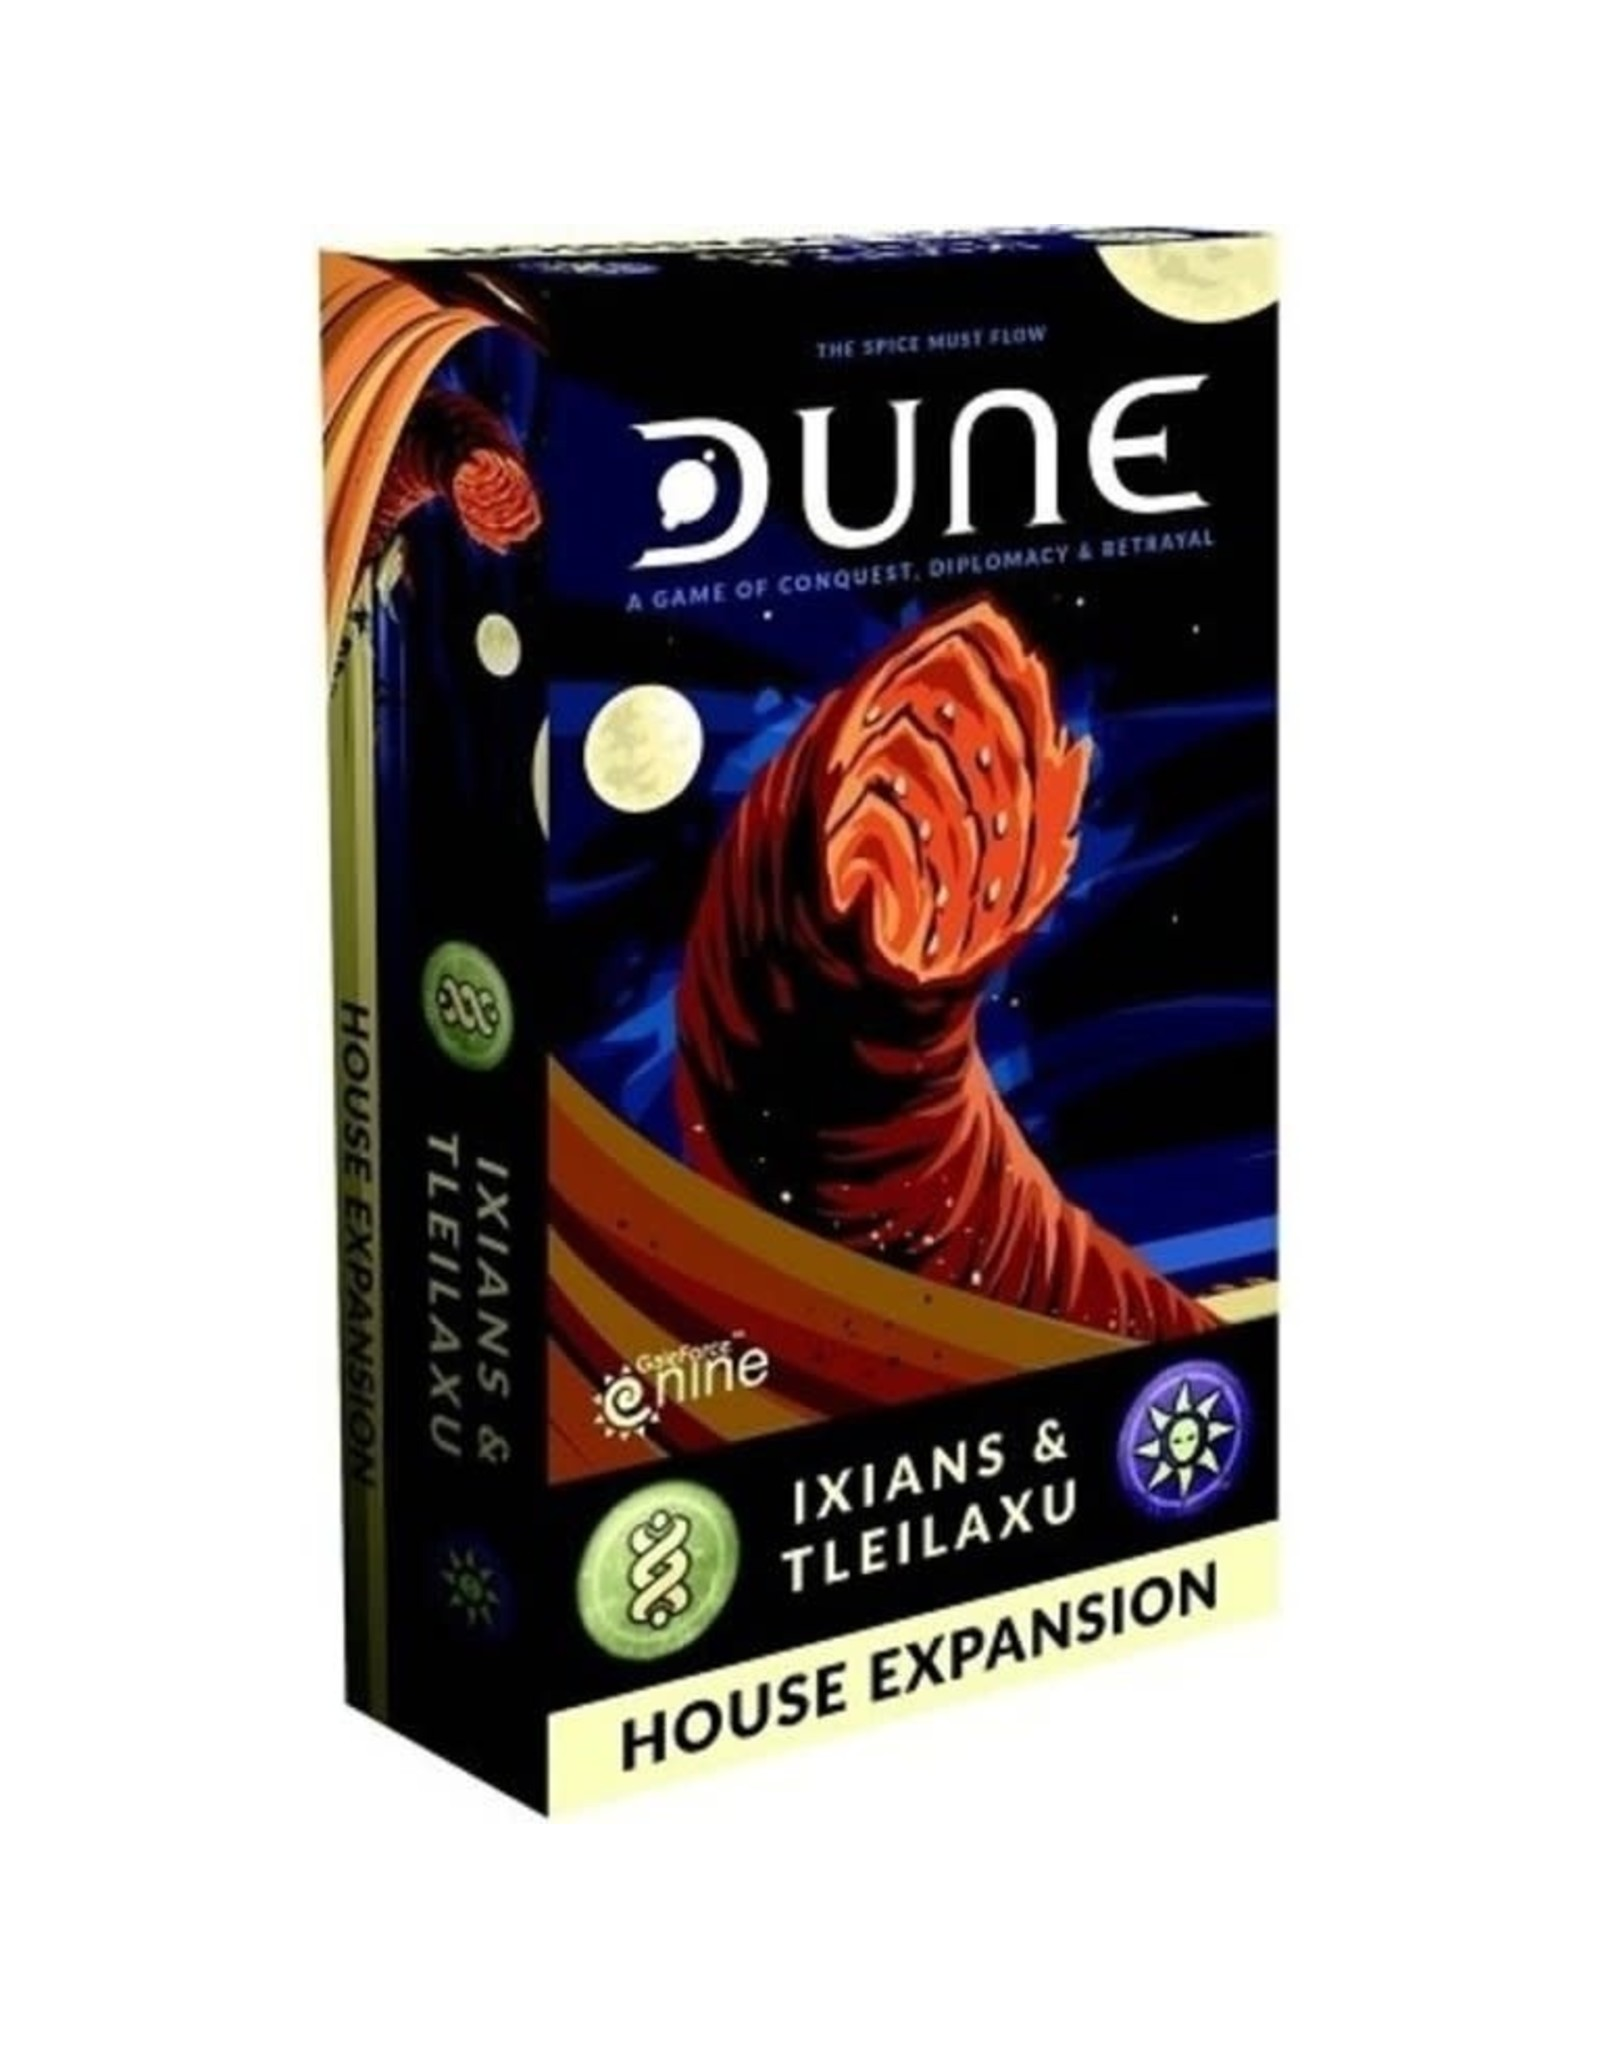 Dune Ixians & Tleilaxu House Expansion